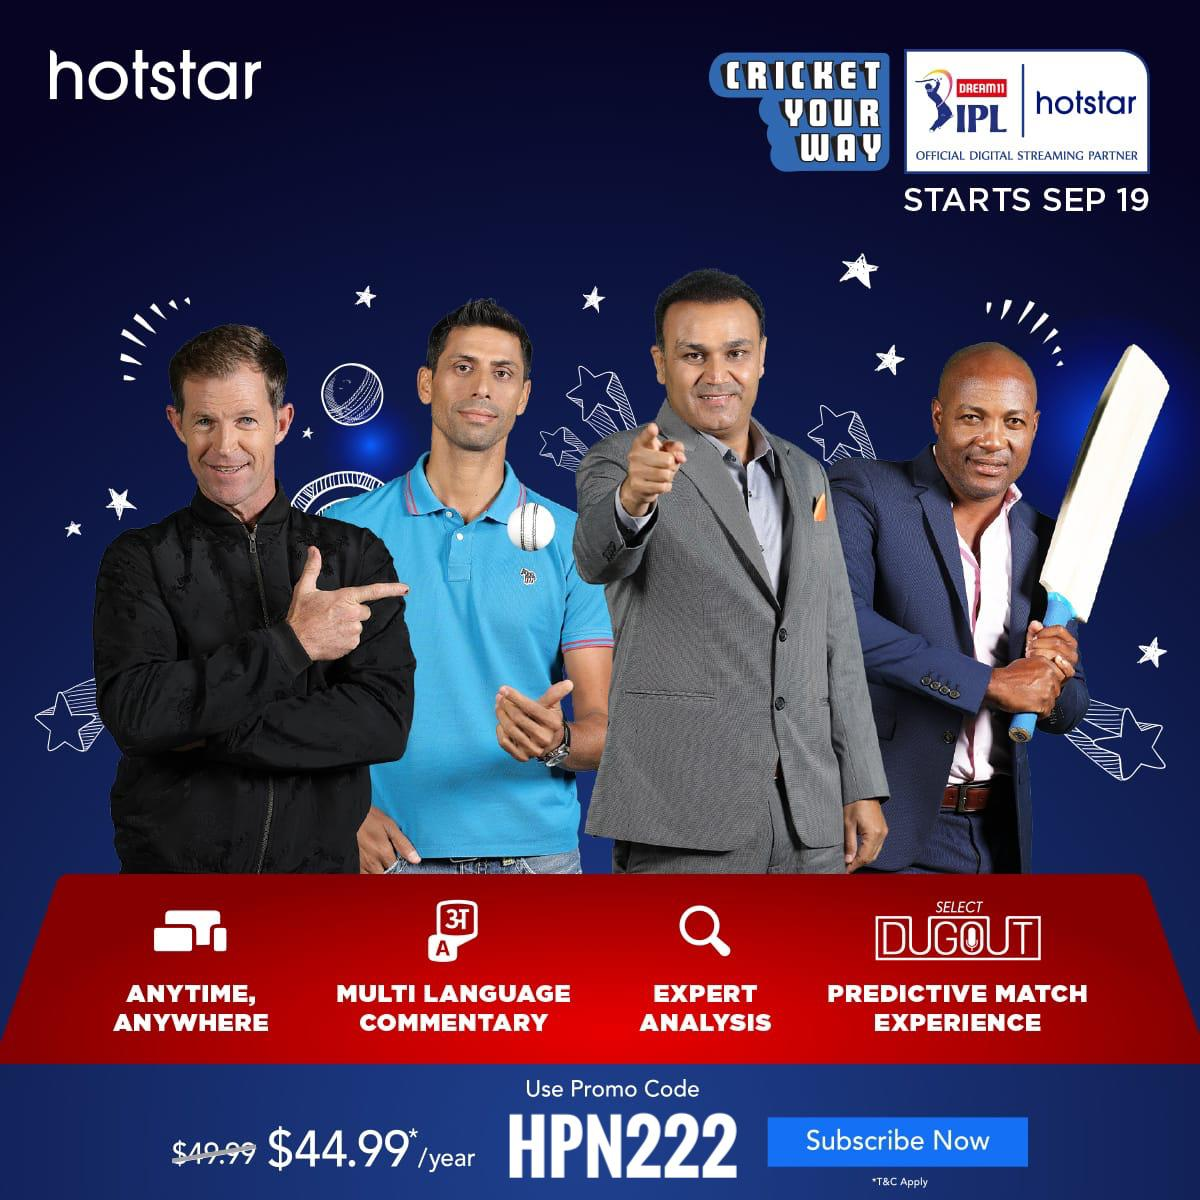 Watch IPL on Hotstar USA